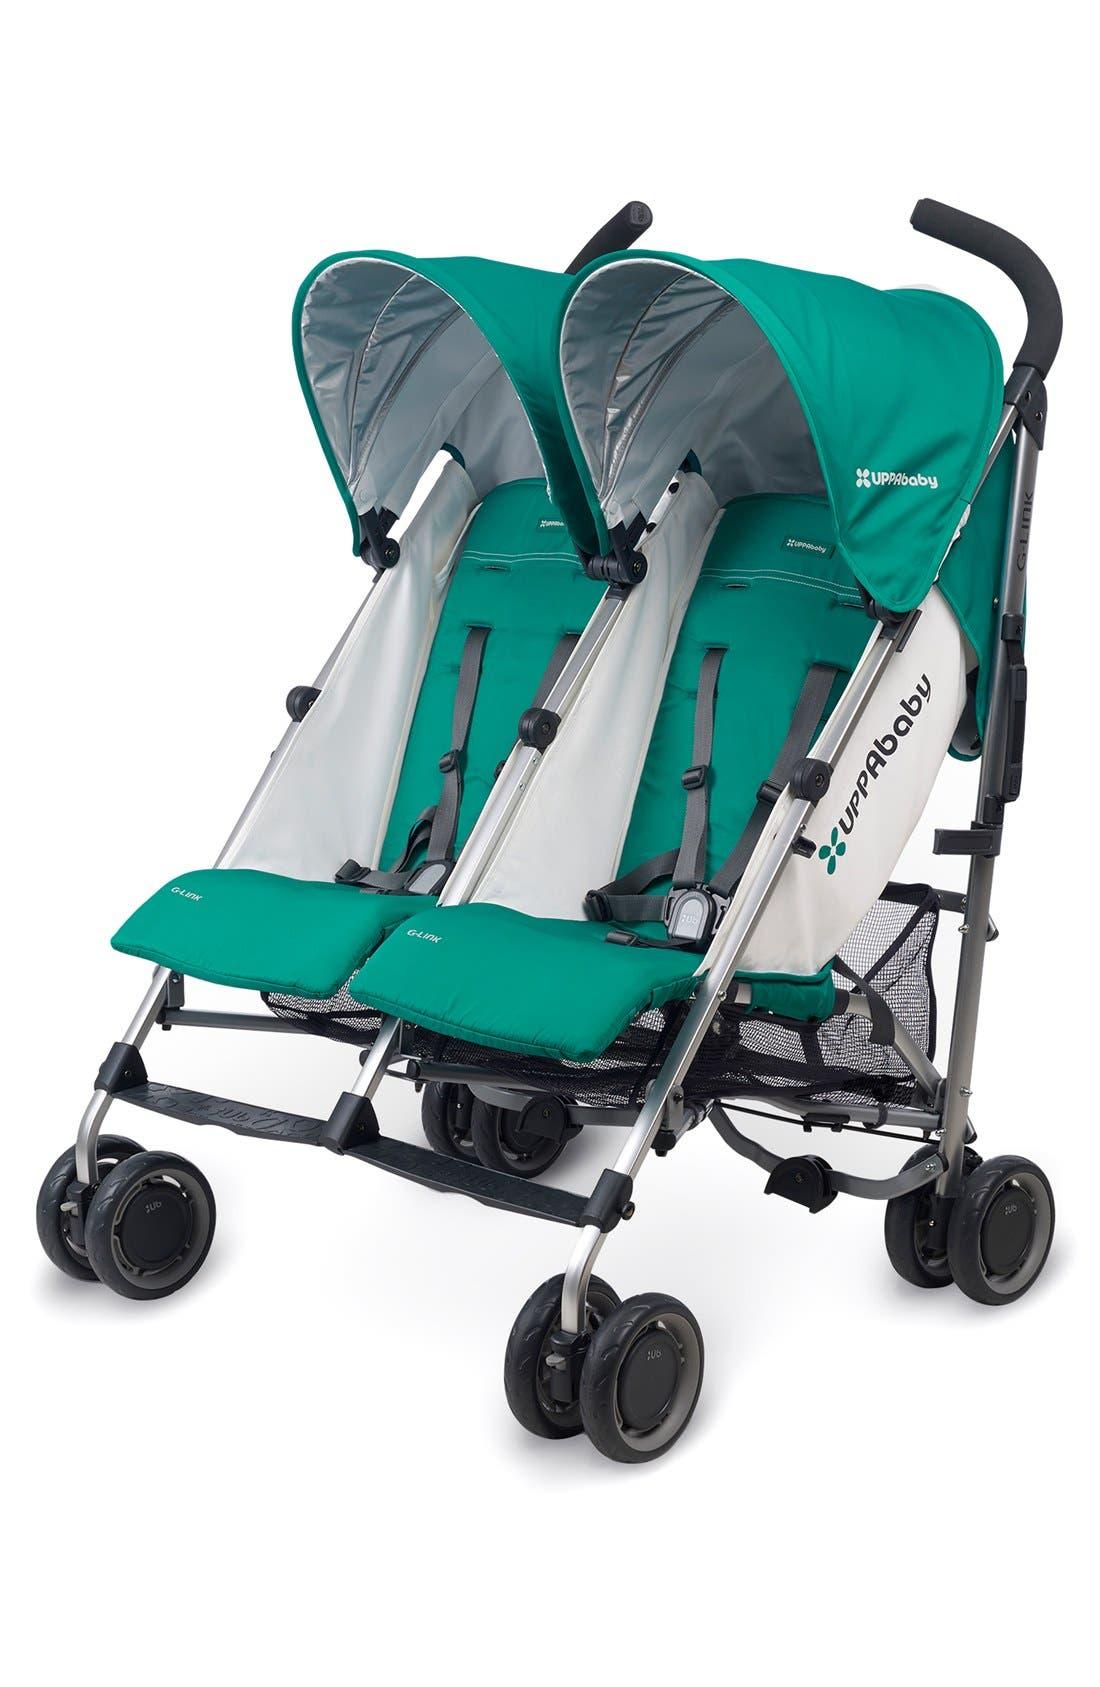 Alternate Image 1 Selected - UPPAbaby G-LINK Ella Aluminum Frame Reclining Side by Side Umbrella Stroller